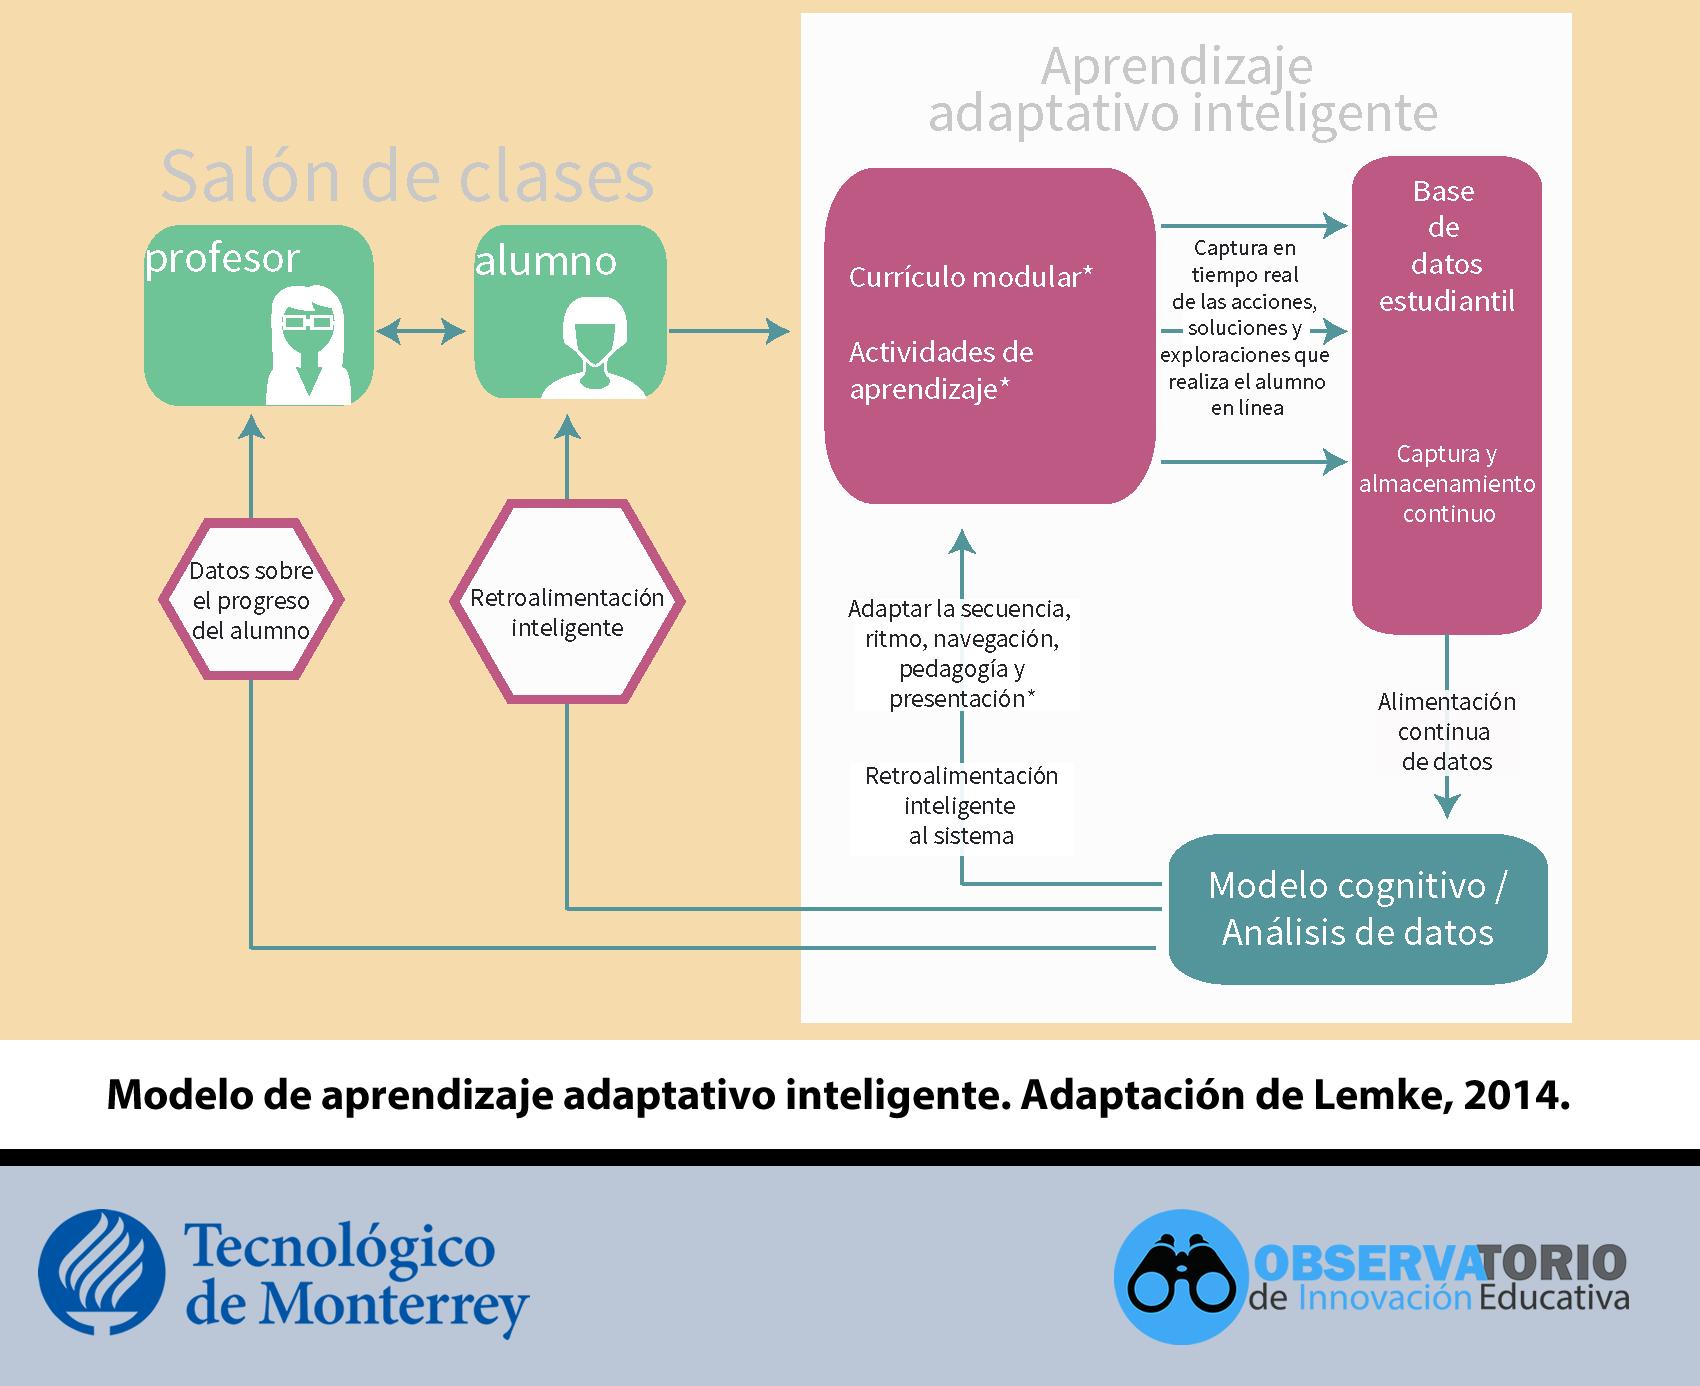 Modelo del aprendizaje adaptativo inteligente